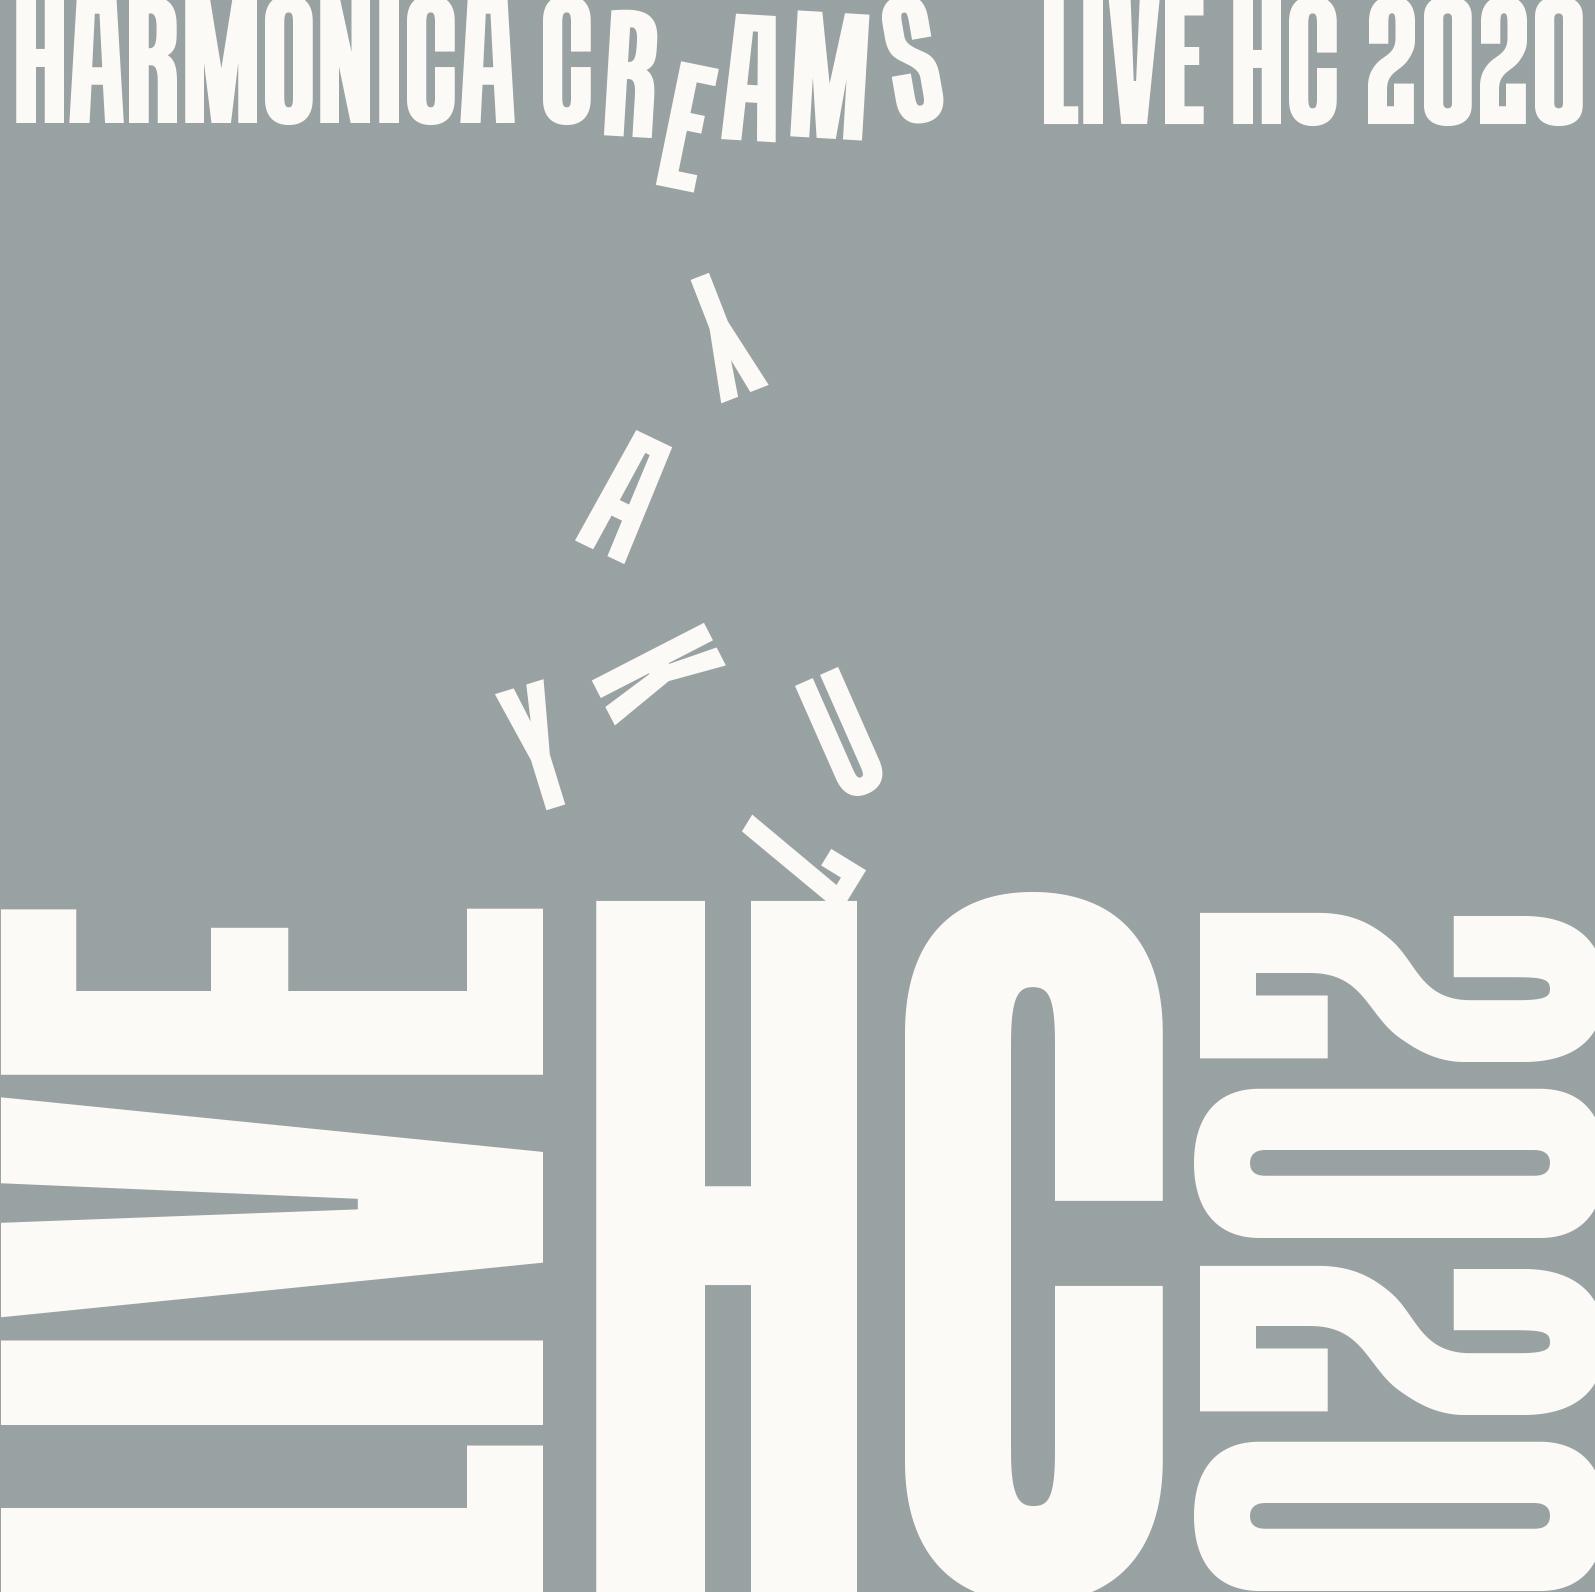 「LIVE HC 2020」